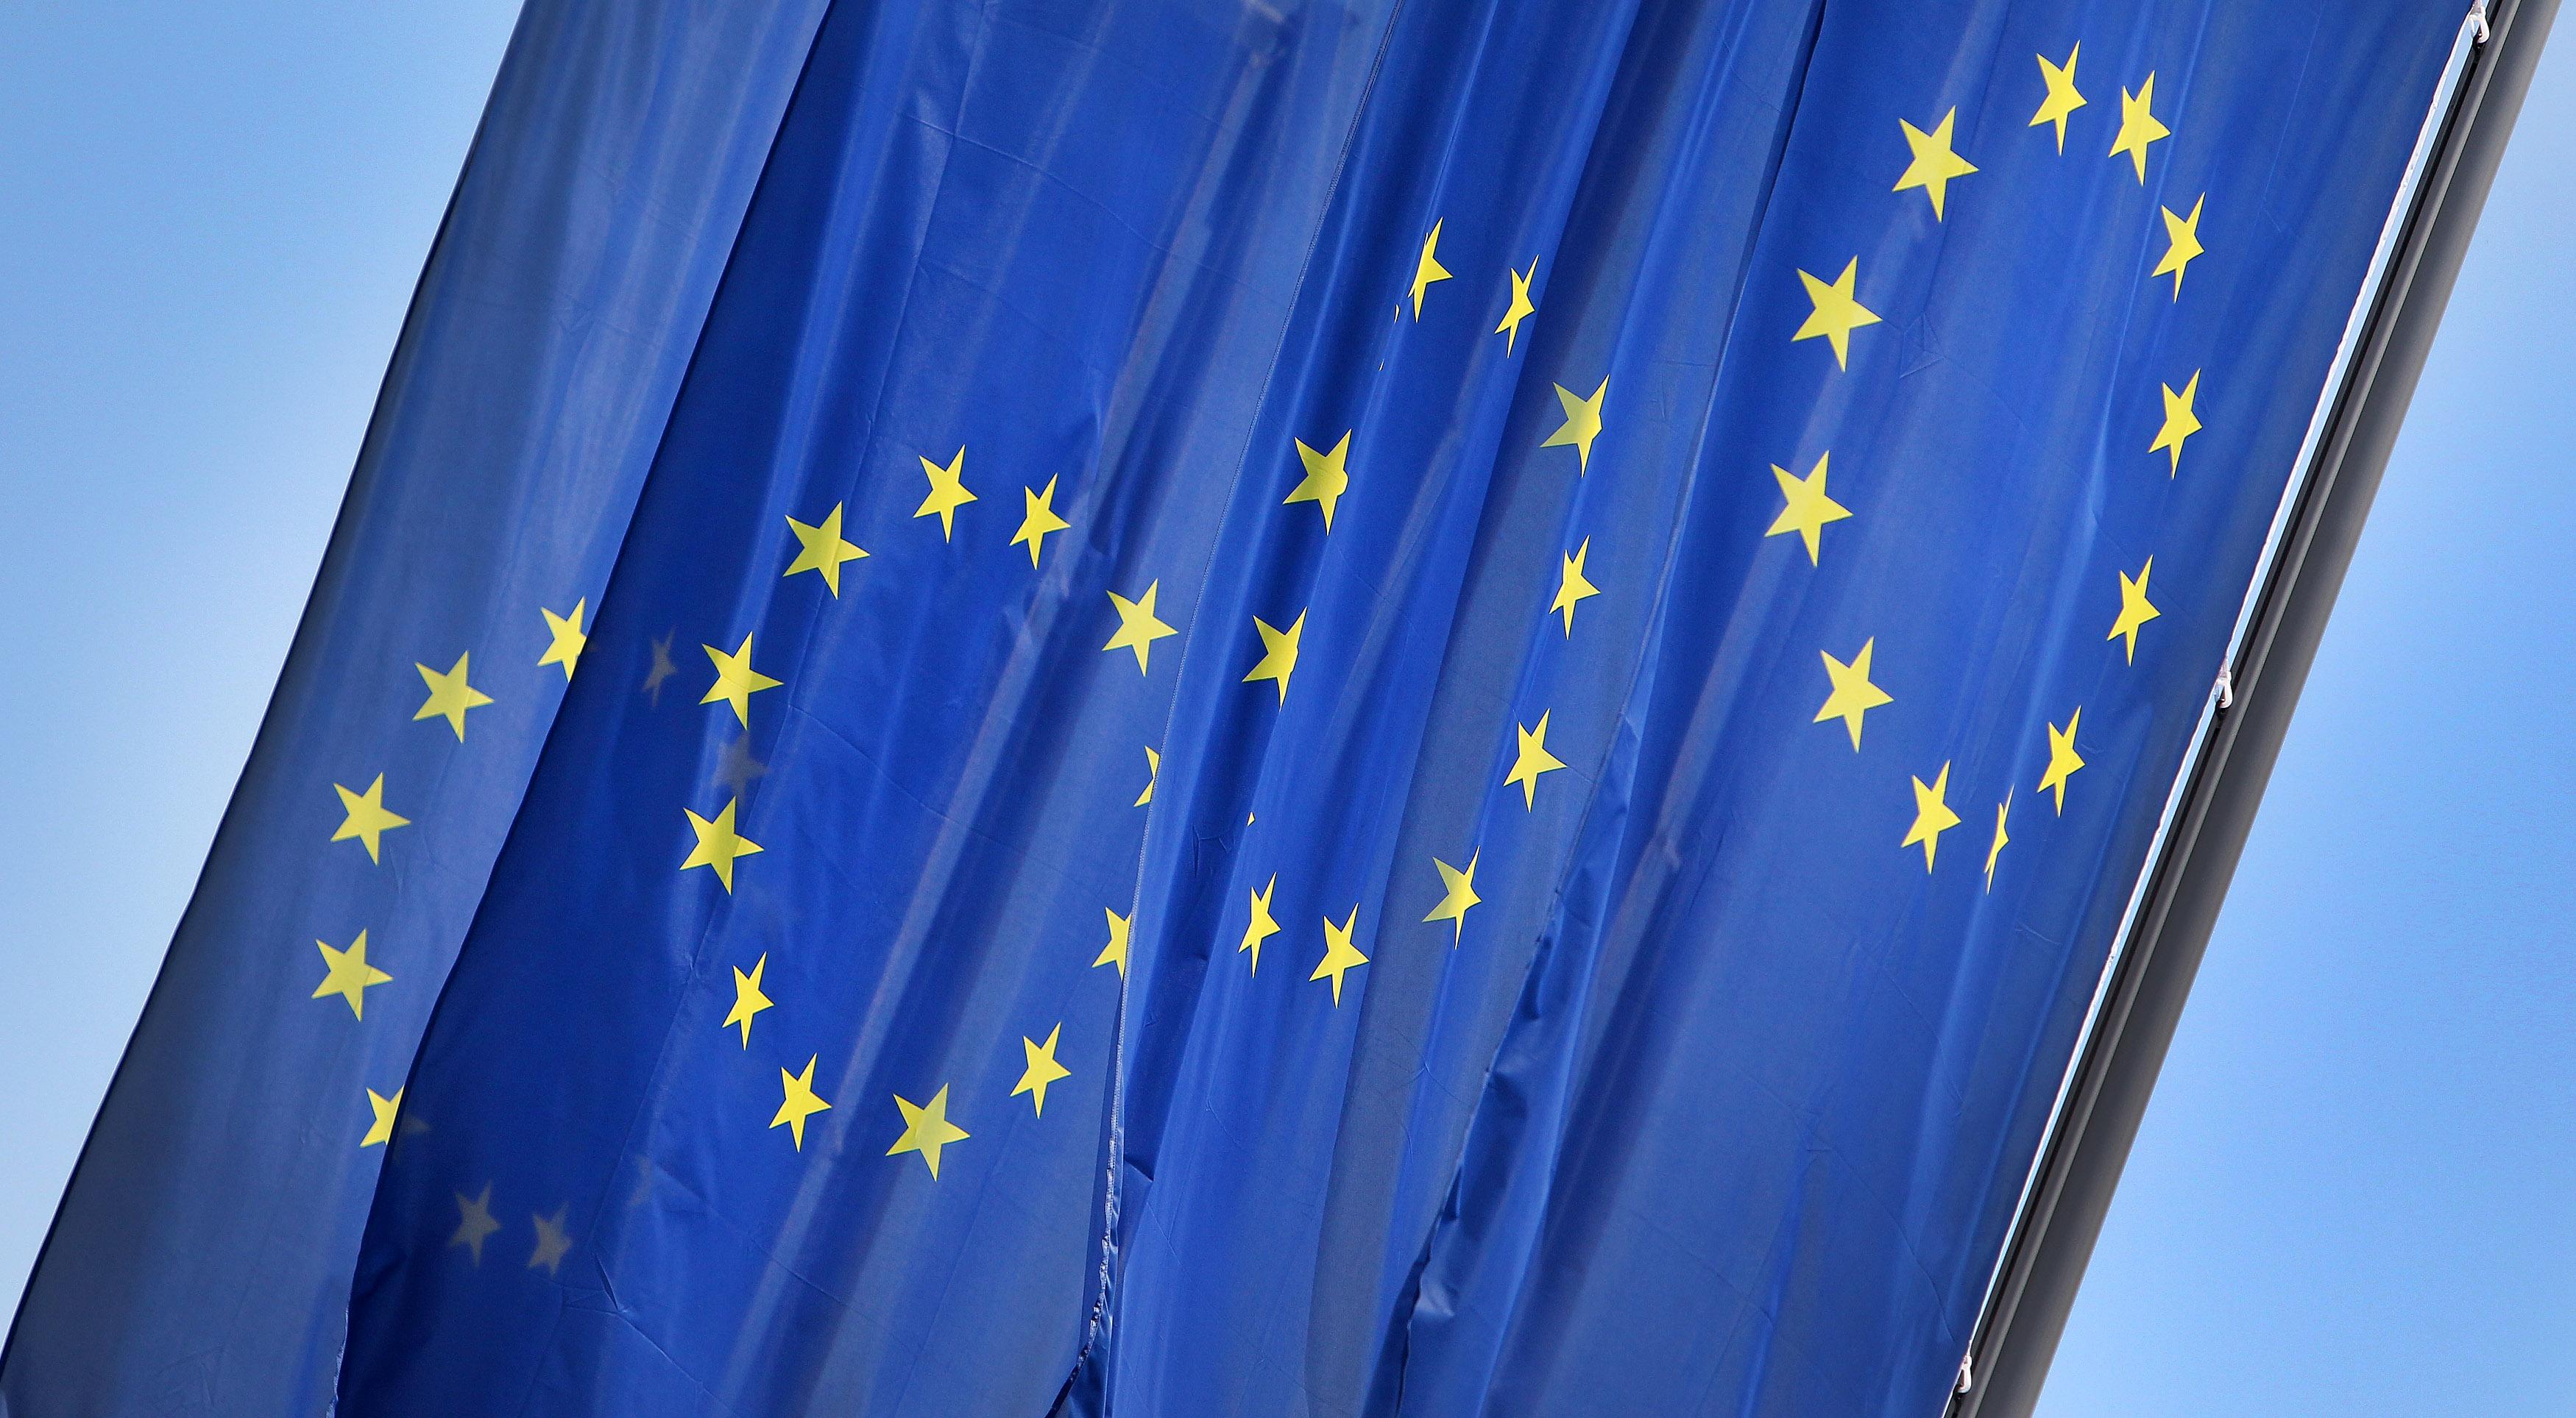 Trotz massiven Korruptions-Problemen: Bulgarien übernimmt EU-Ratspräsidentschaft